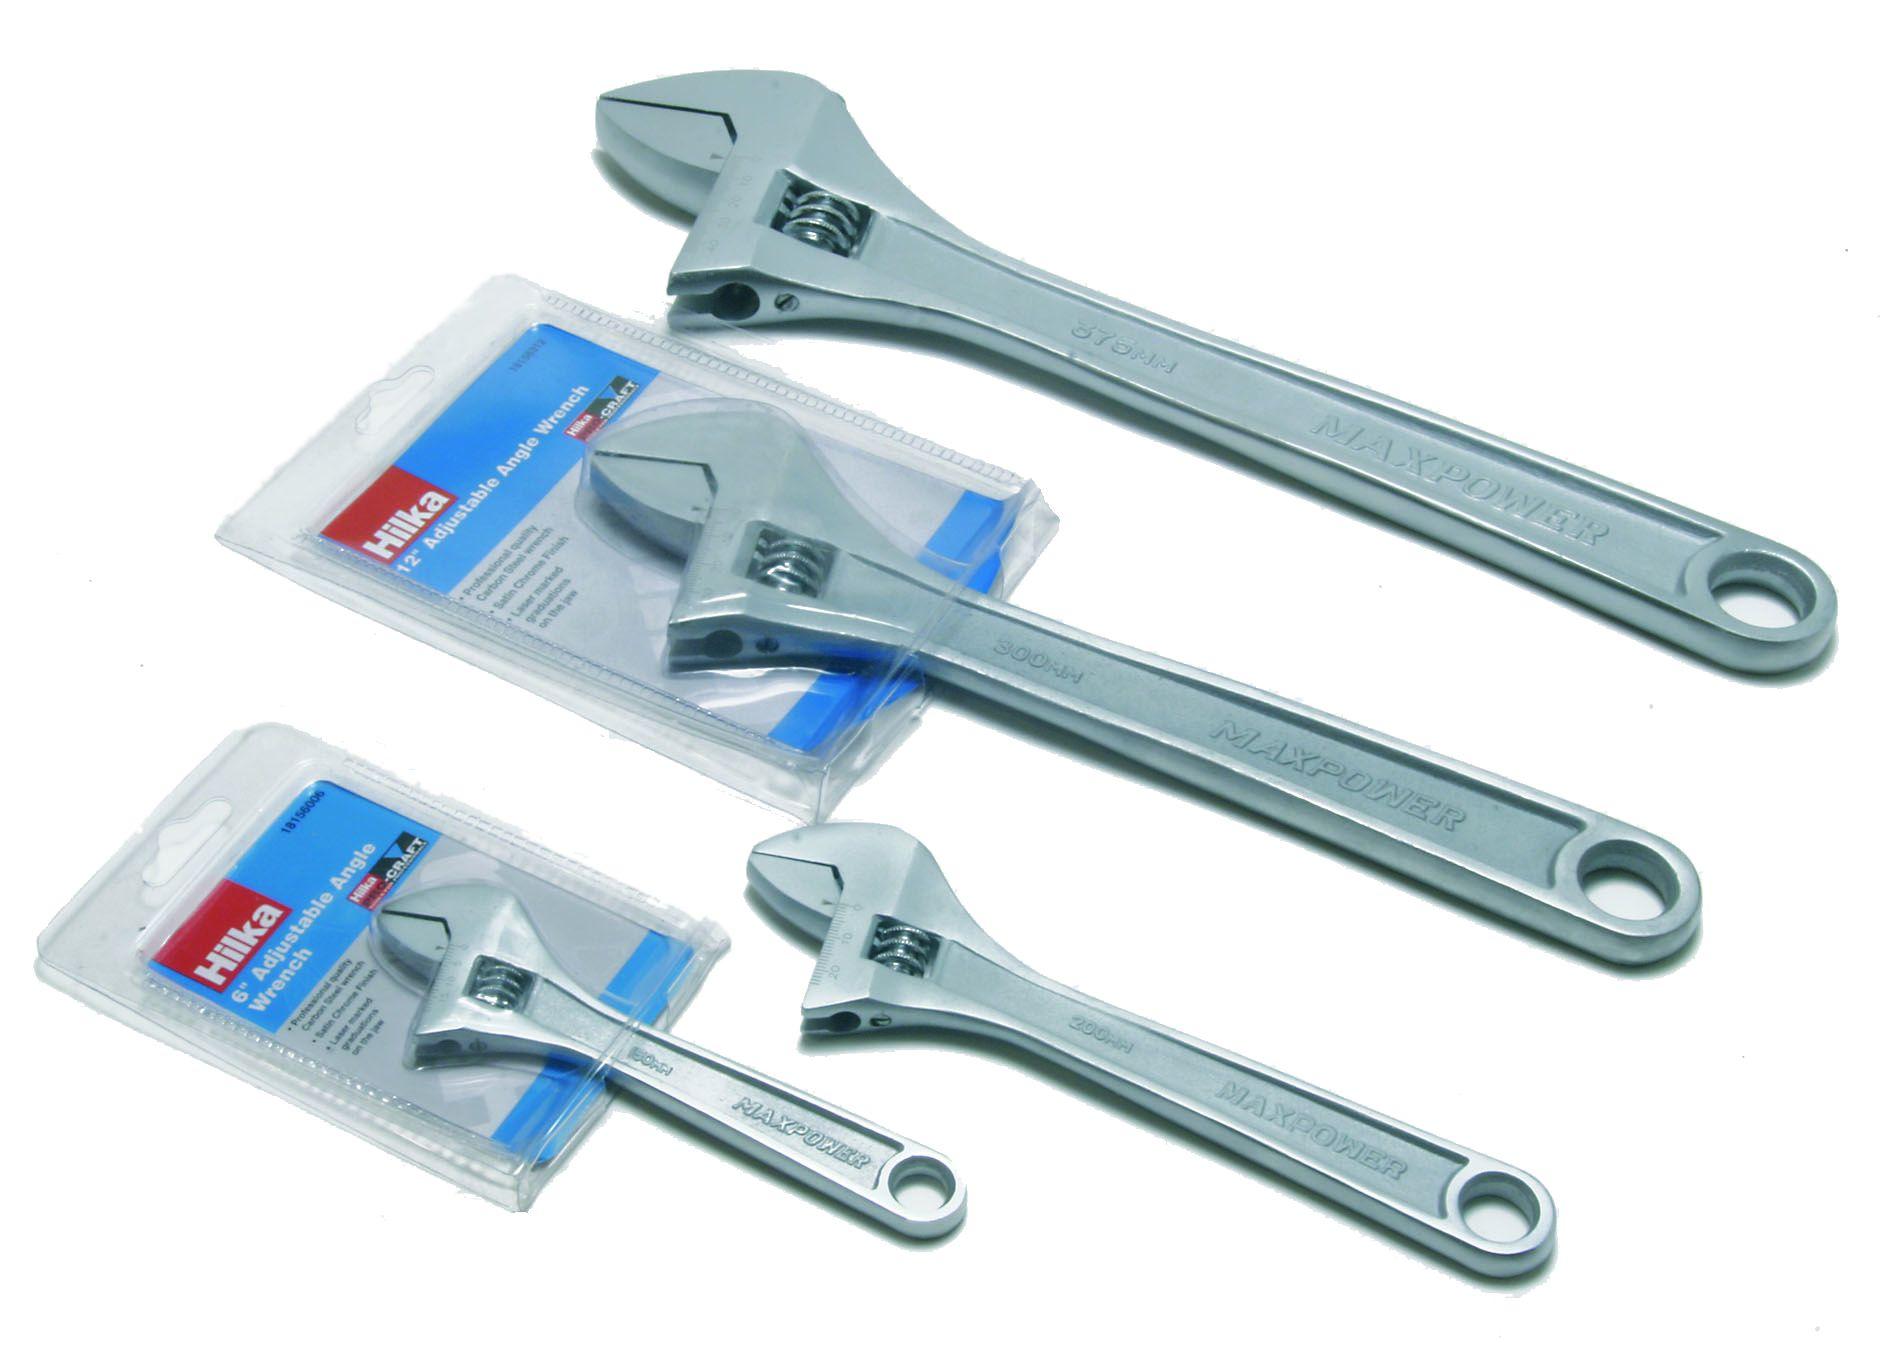 Hilka Pro Craft Satin Finish Adjustable Wrenches